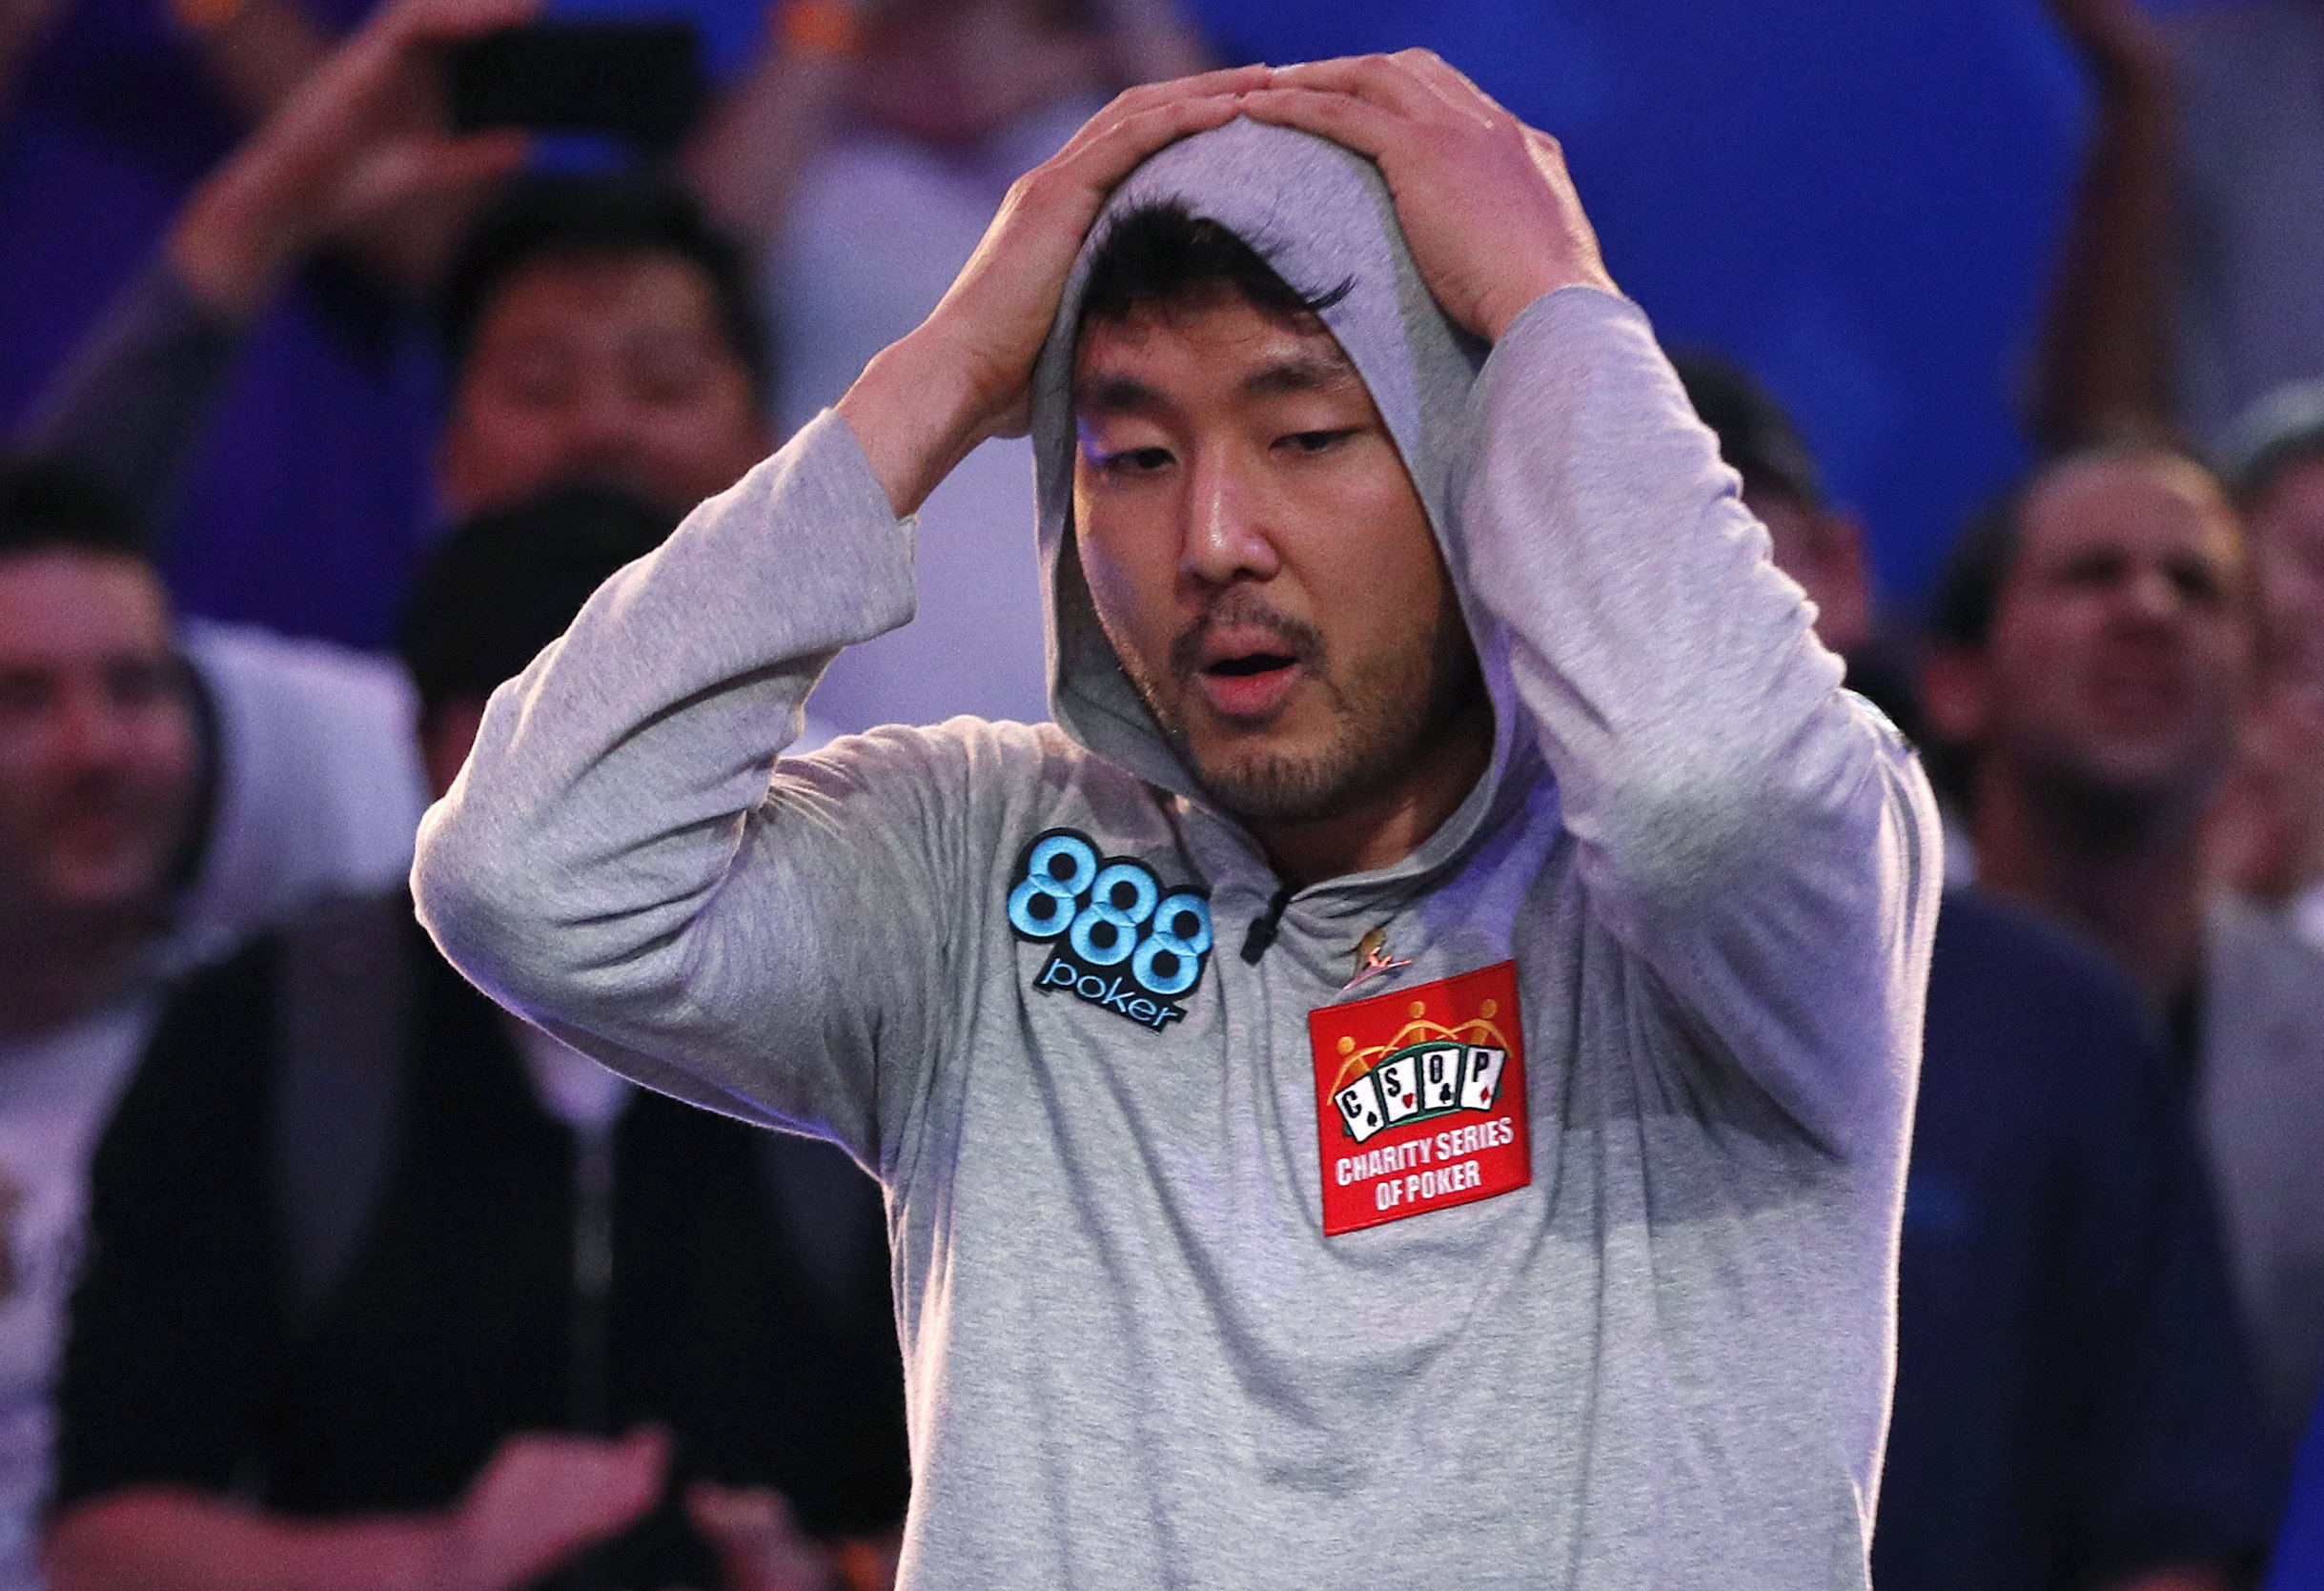 John Cynn claims World Series of Poker title, wins $8.8M